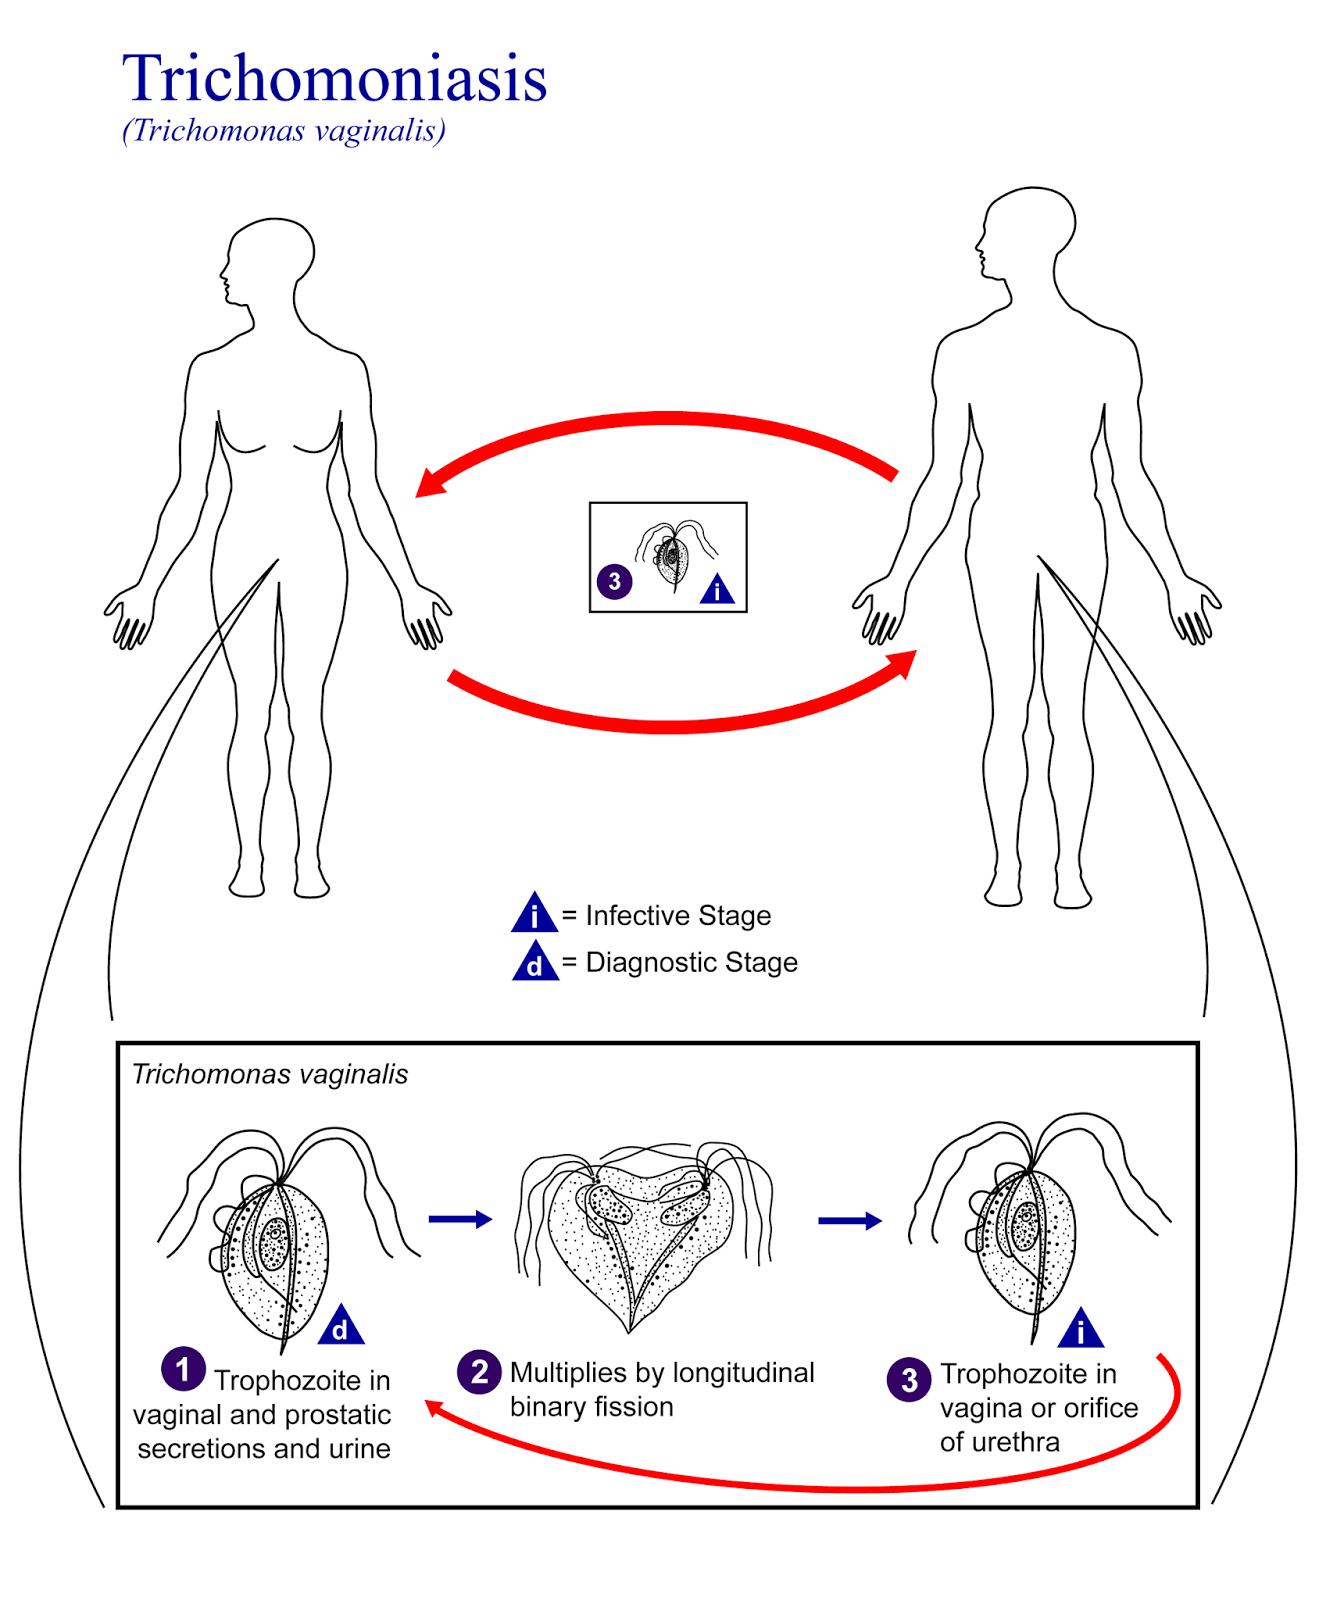 http://sehatmasakini.blogspot.com/2014/09/mengenal-penyakit-trichomoniasis.html